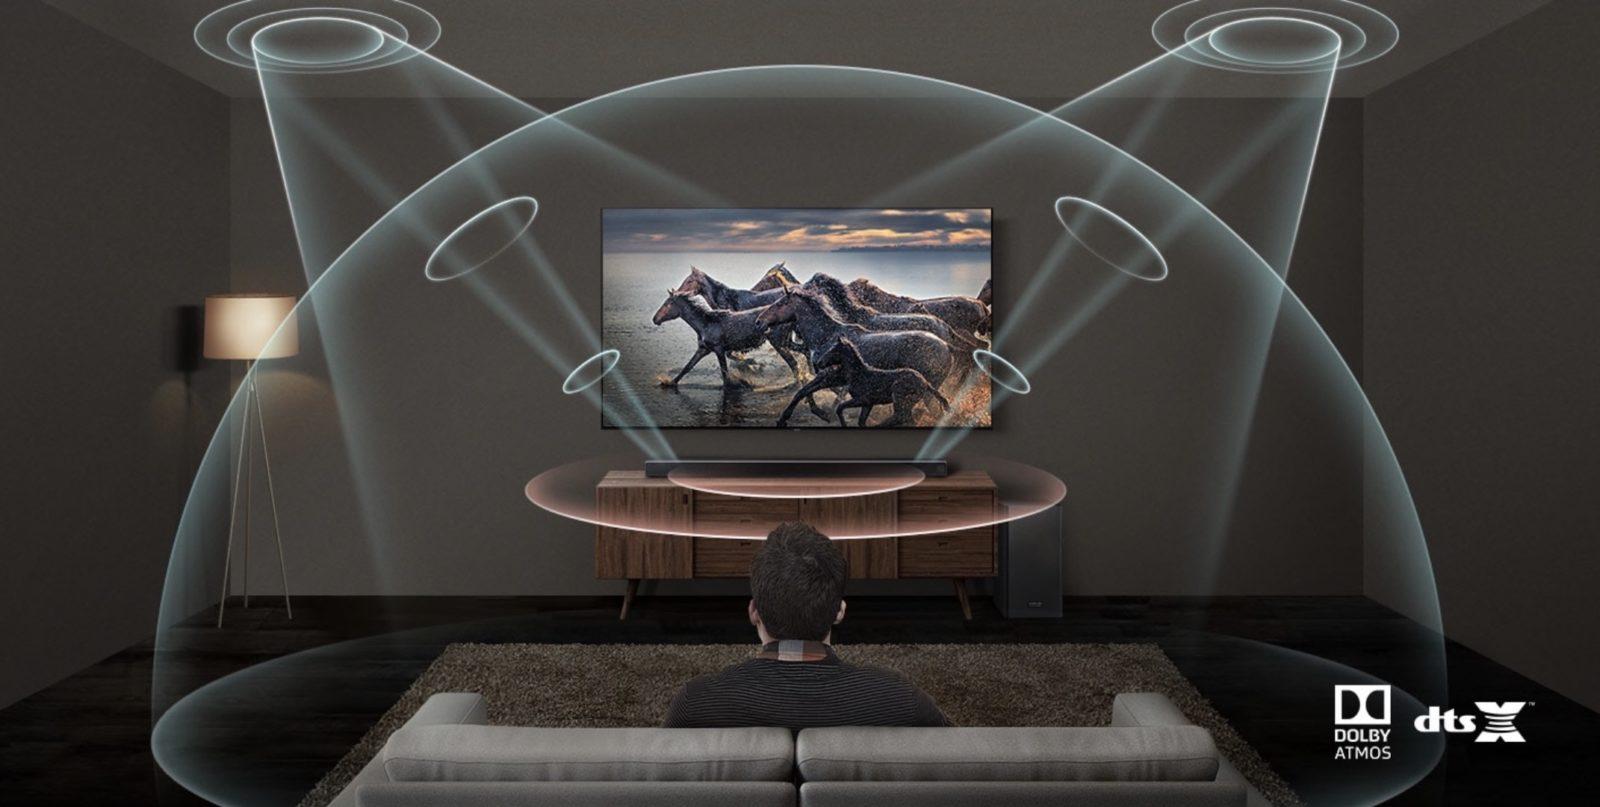 Soundbar Samsung harman/kardon HW-Q70R 3.1.2 in sconto di oltre 100 euro su eBay